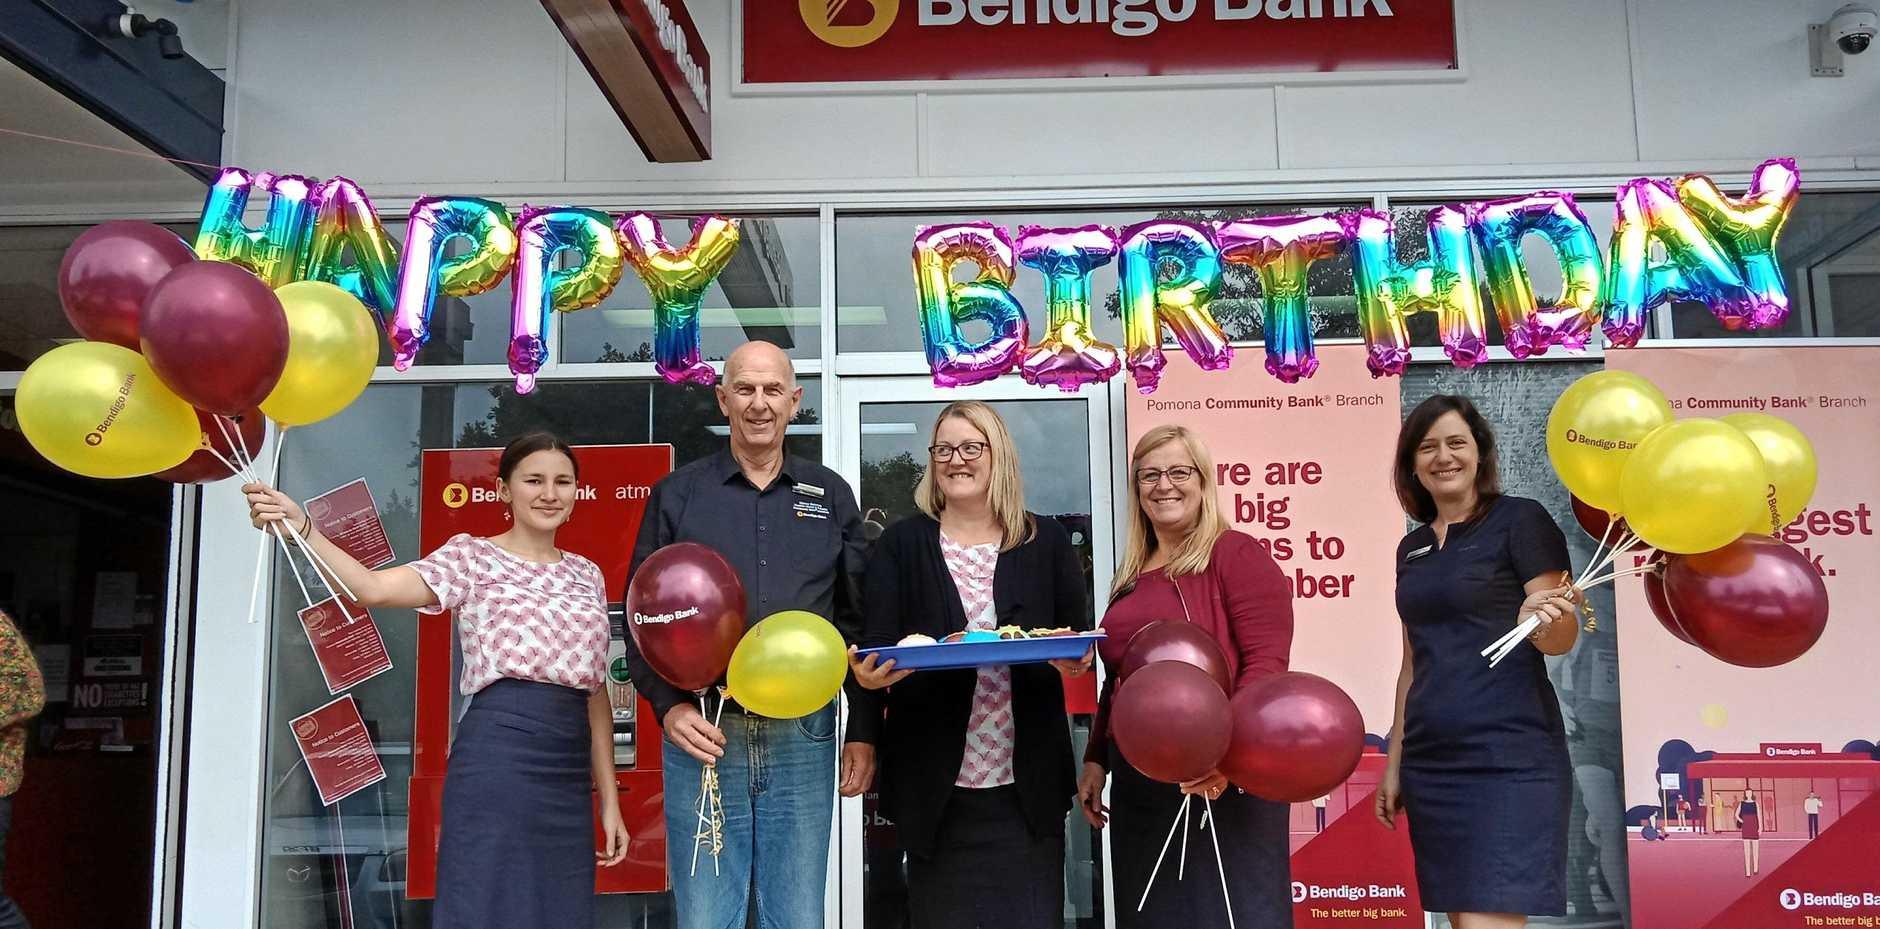 HAPPY BIRTHDAY: Ella Dawes, SCCFSL chairman Rick Cooper, Simone Flavelle, Jo Winter and Amanda Schilds celebrate Pomona Community Bank branch's second birthday.